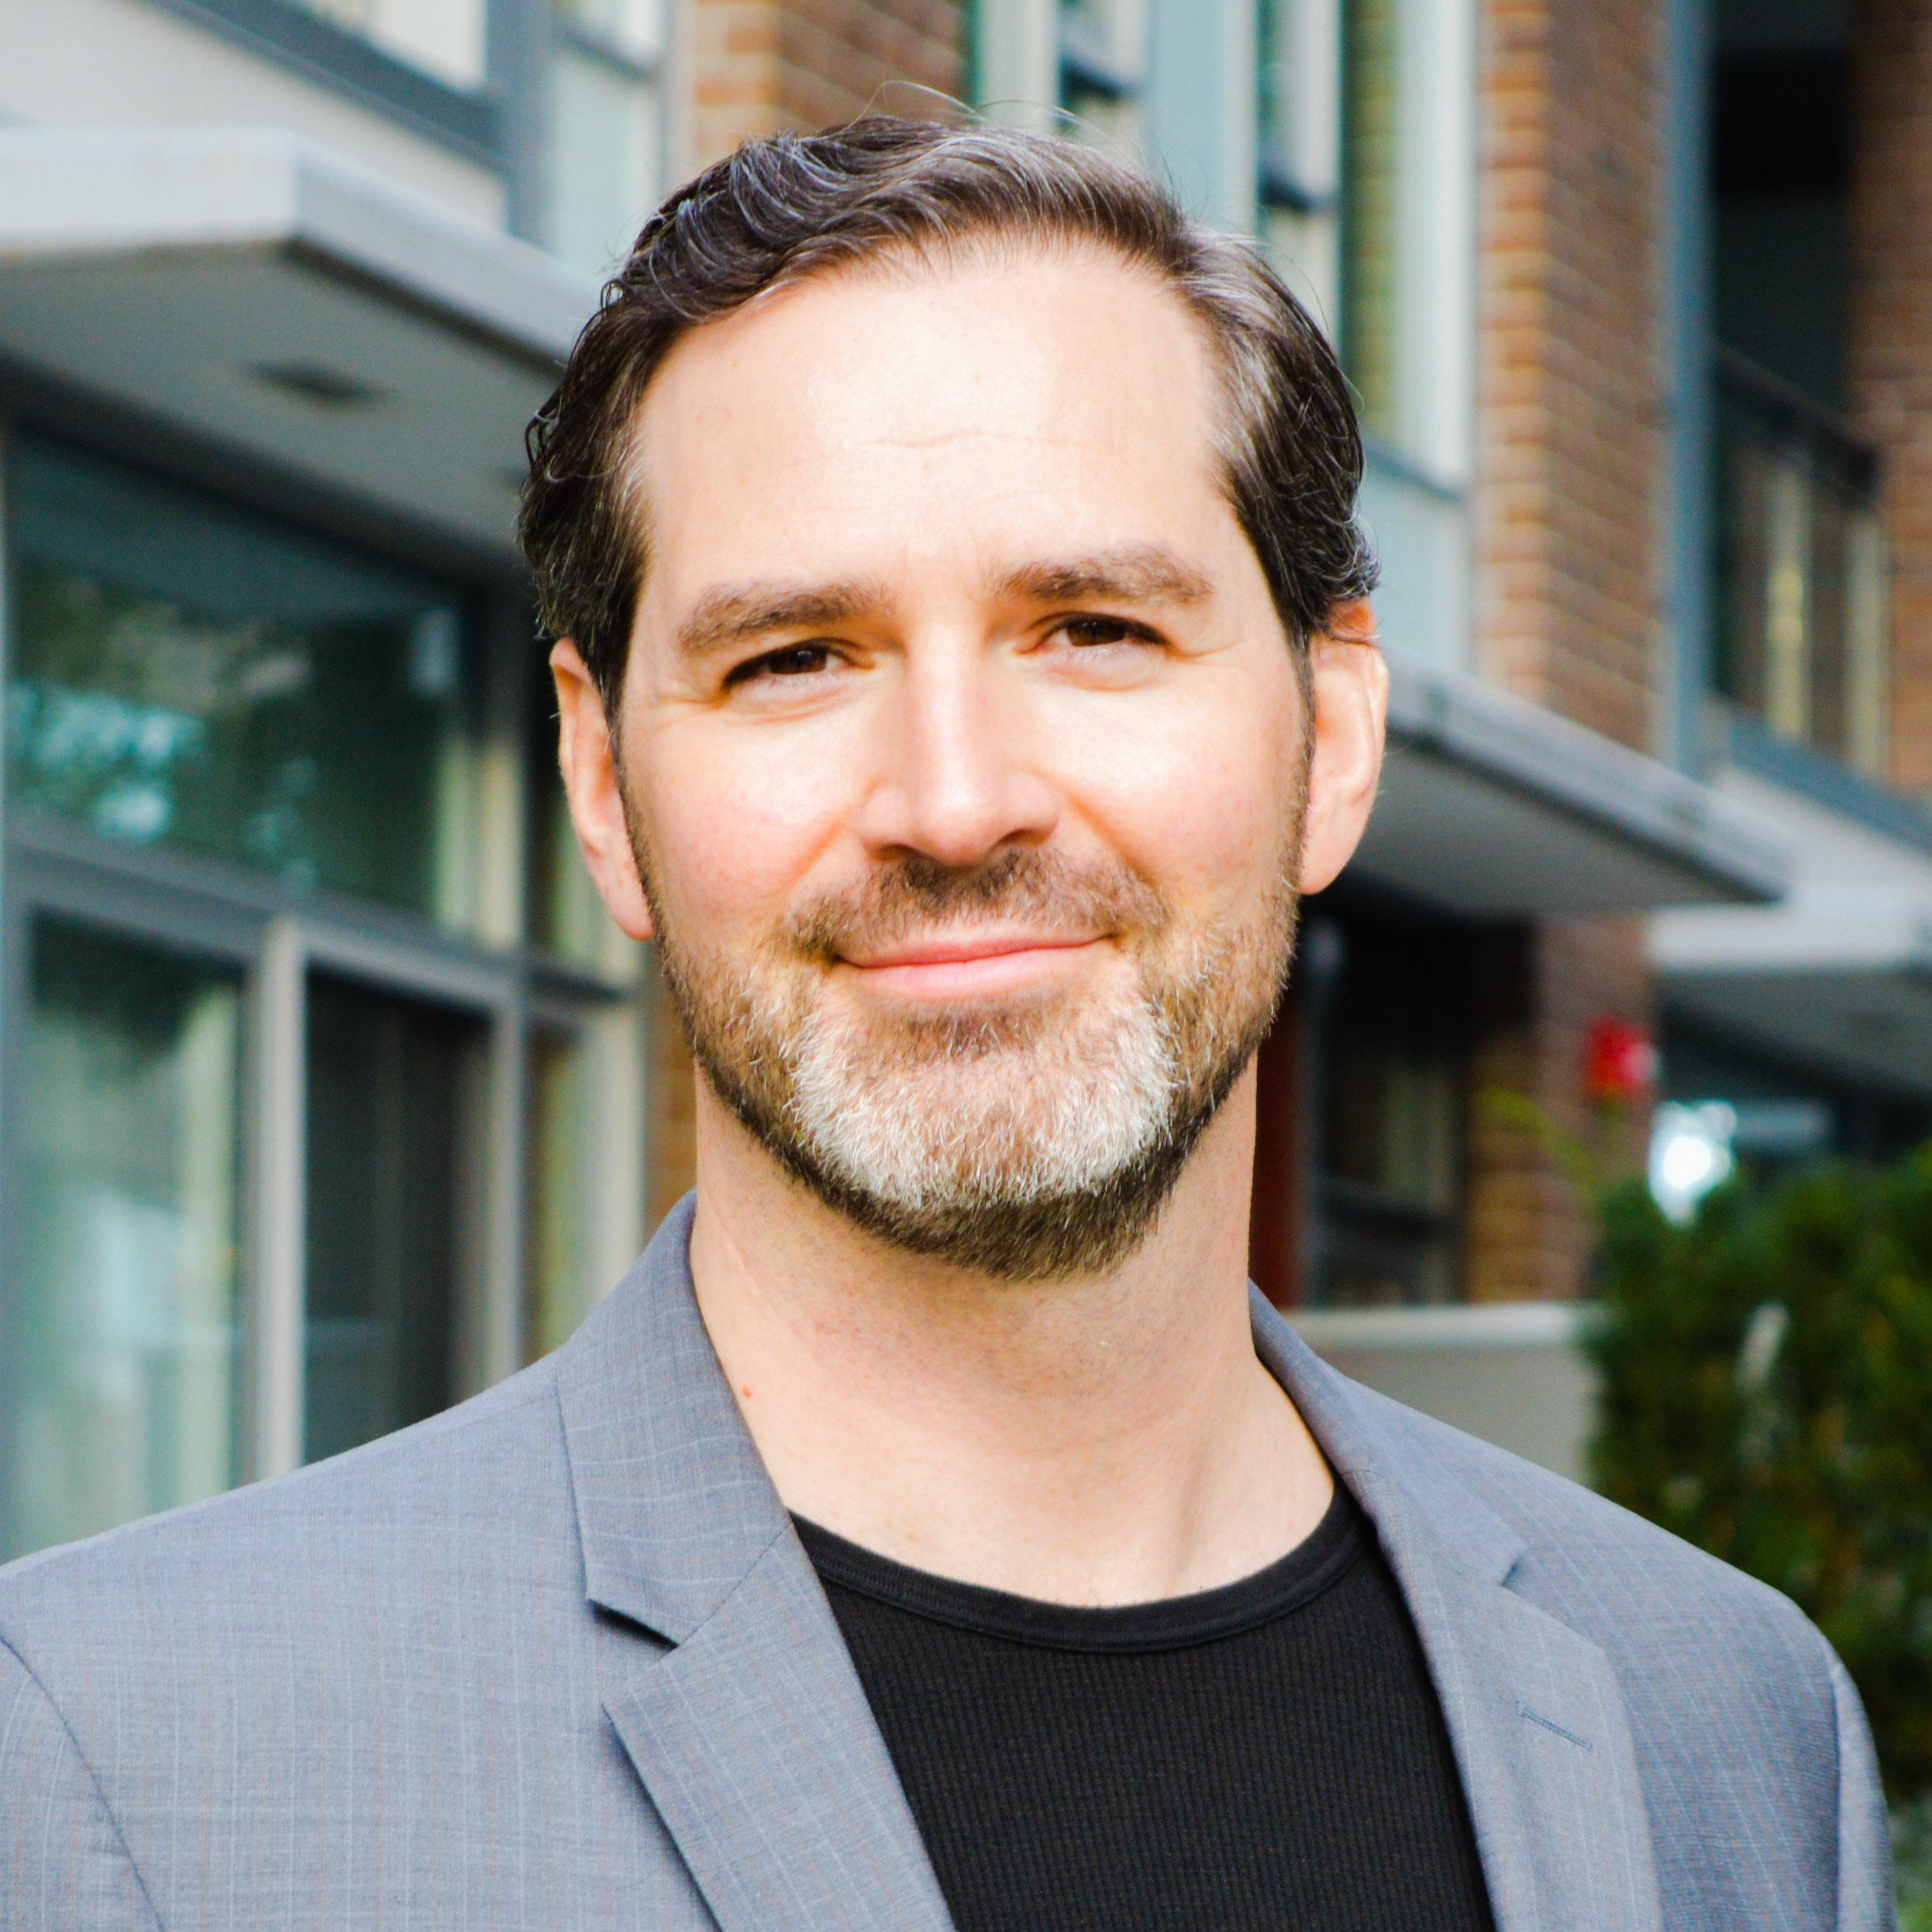 David Stroud Founder Mortgage Sandbox